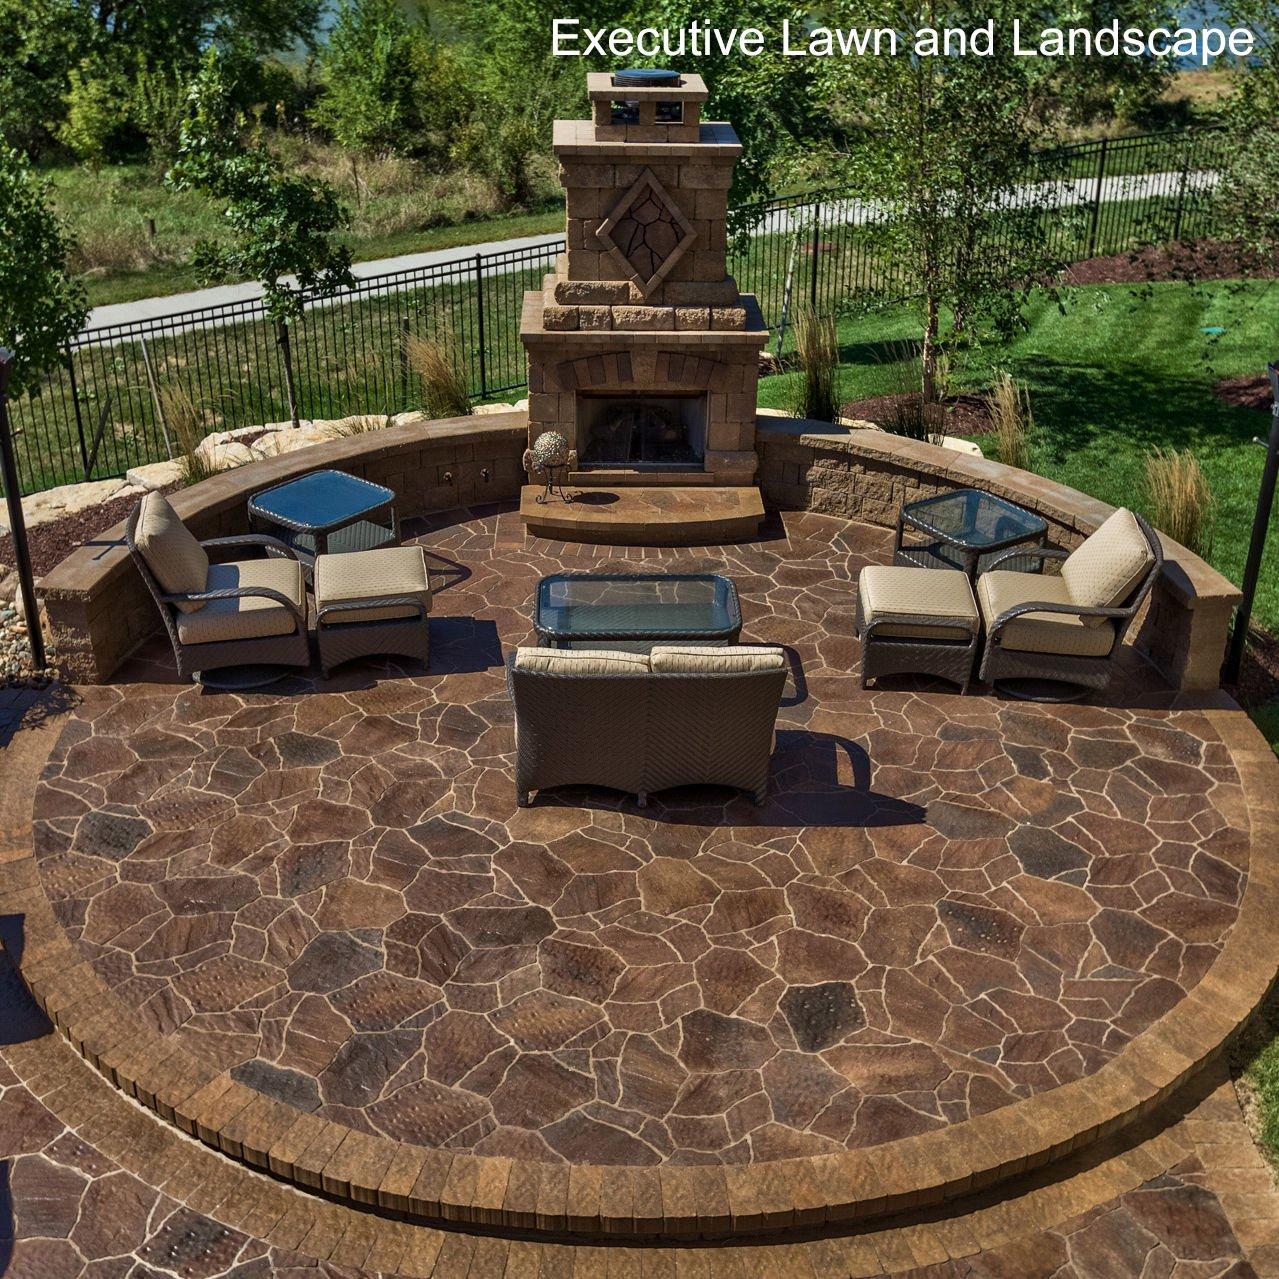 Outdoor Patio Furniture Omaha Ne: 2017 Omaha Home Show